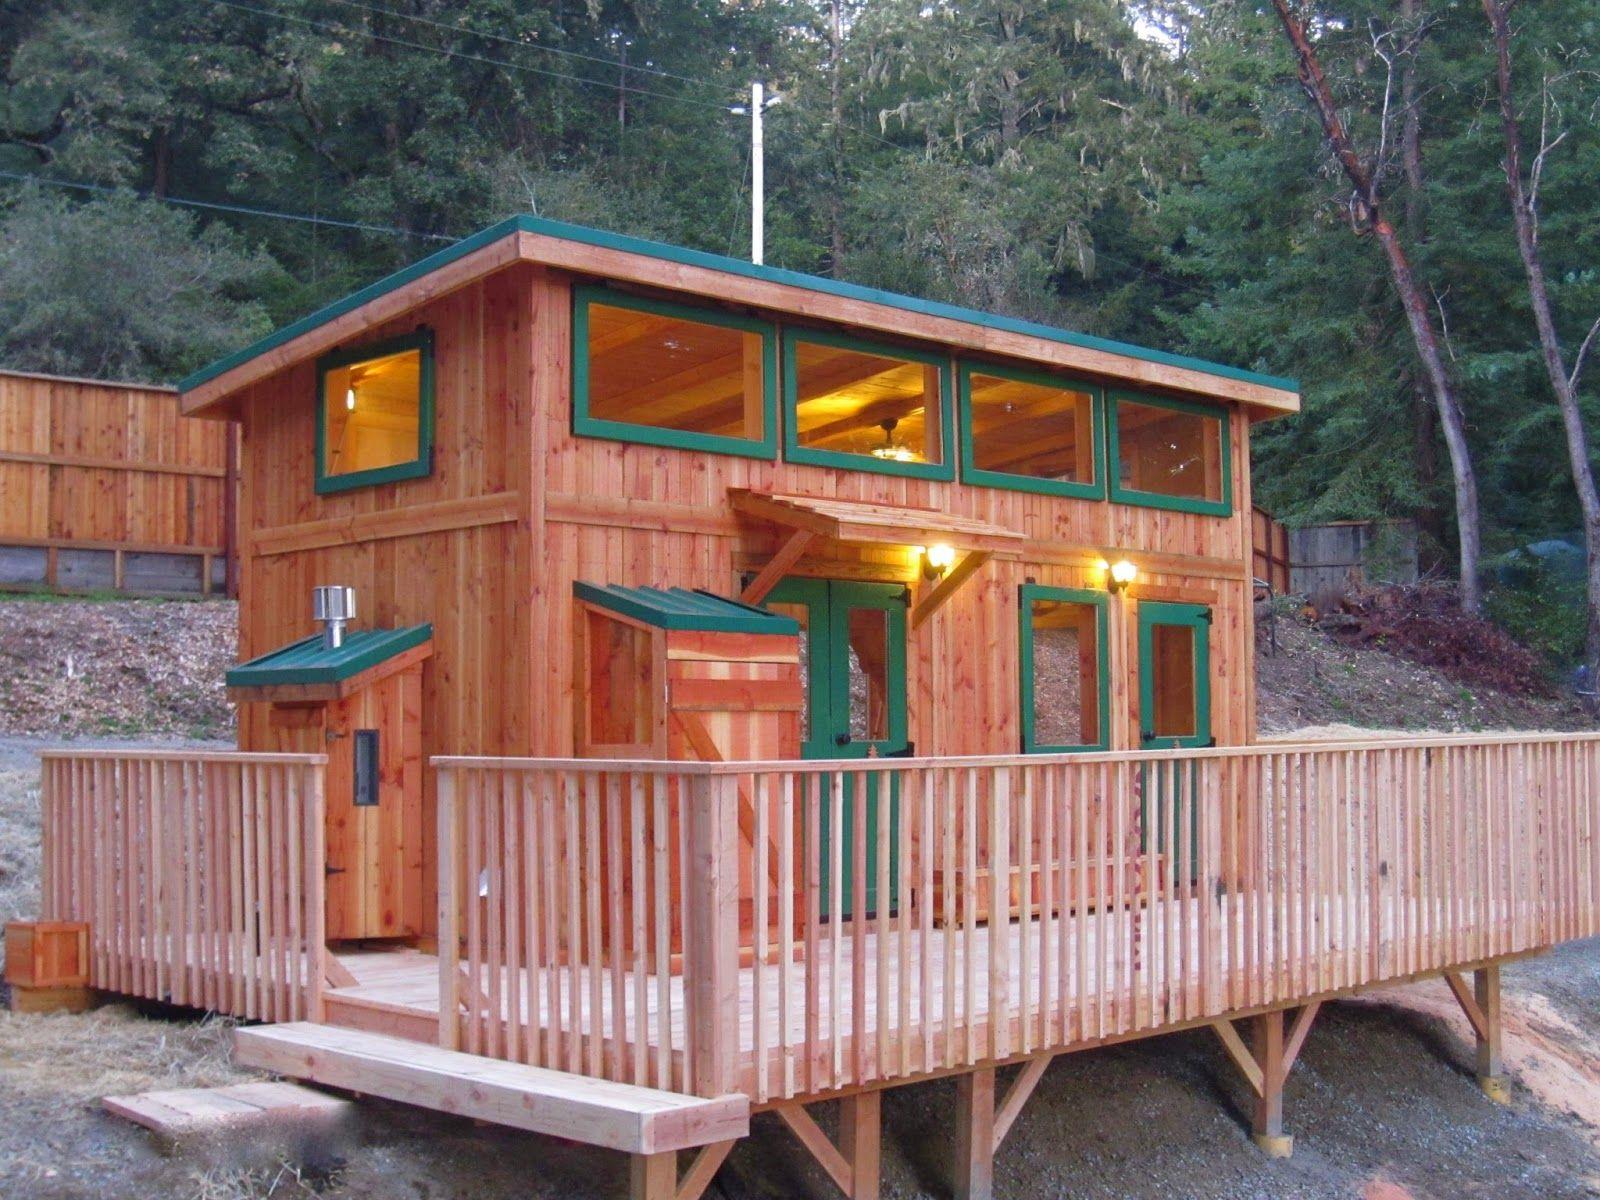 Best New 9X20 Hunter Green Cabin With 10X12 Studio We Build 400 x 300